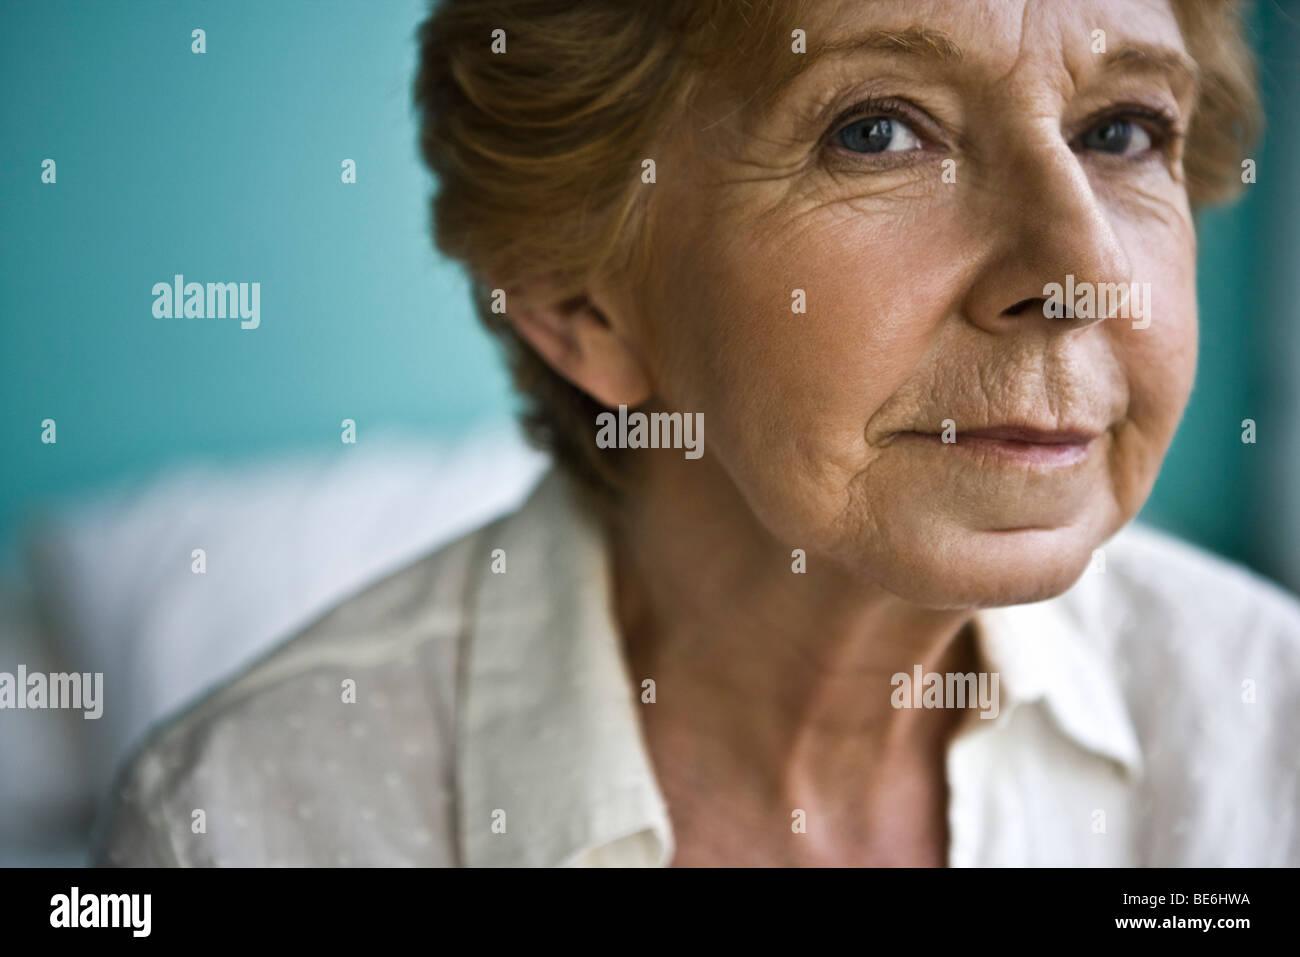 Senior woman, close-up Photo Stock